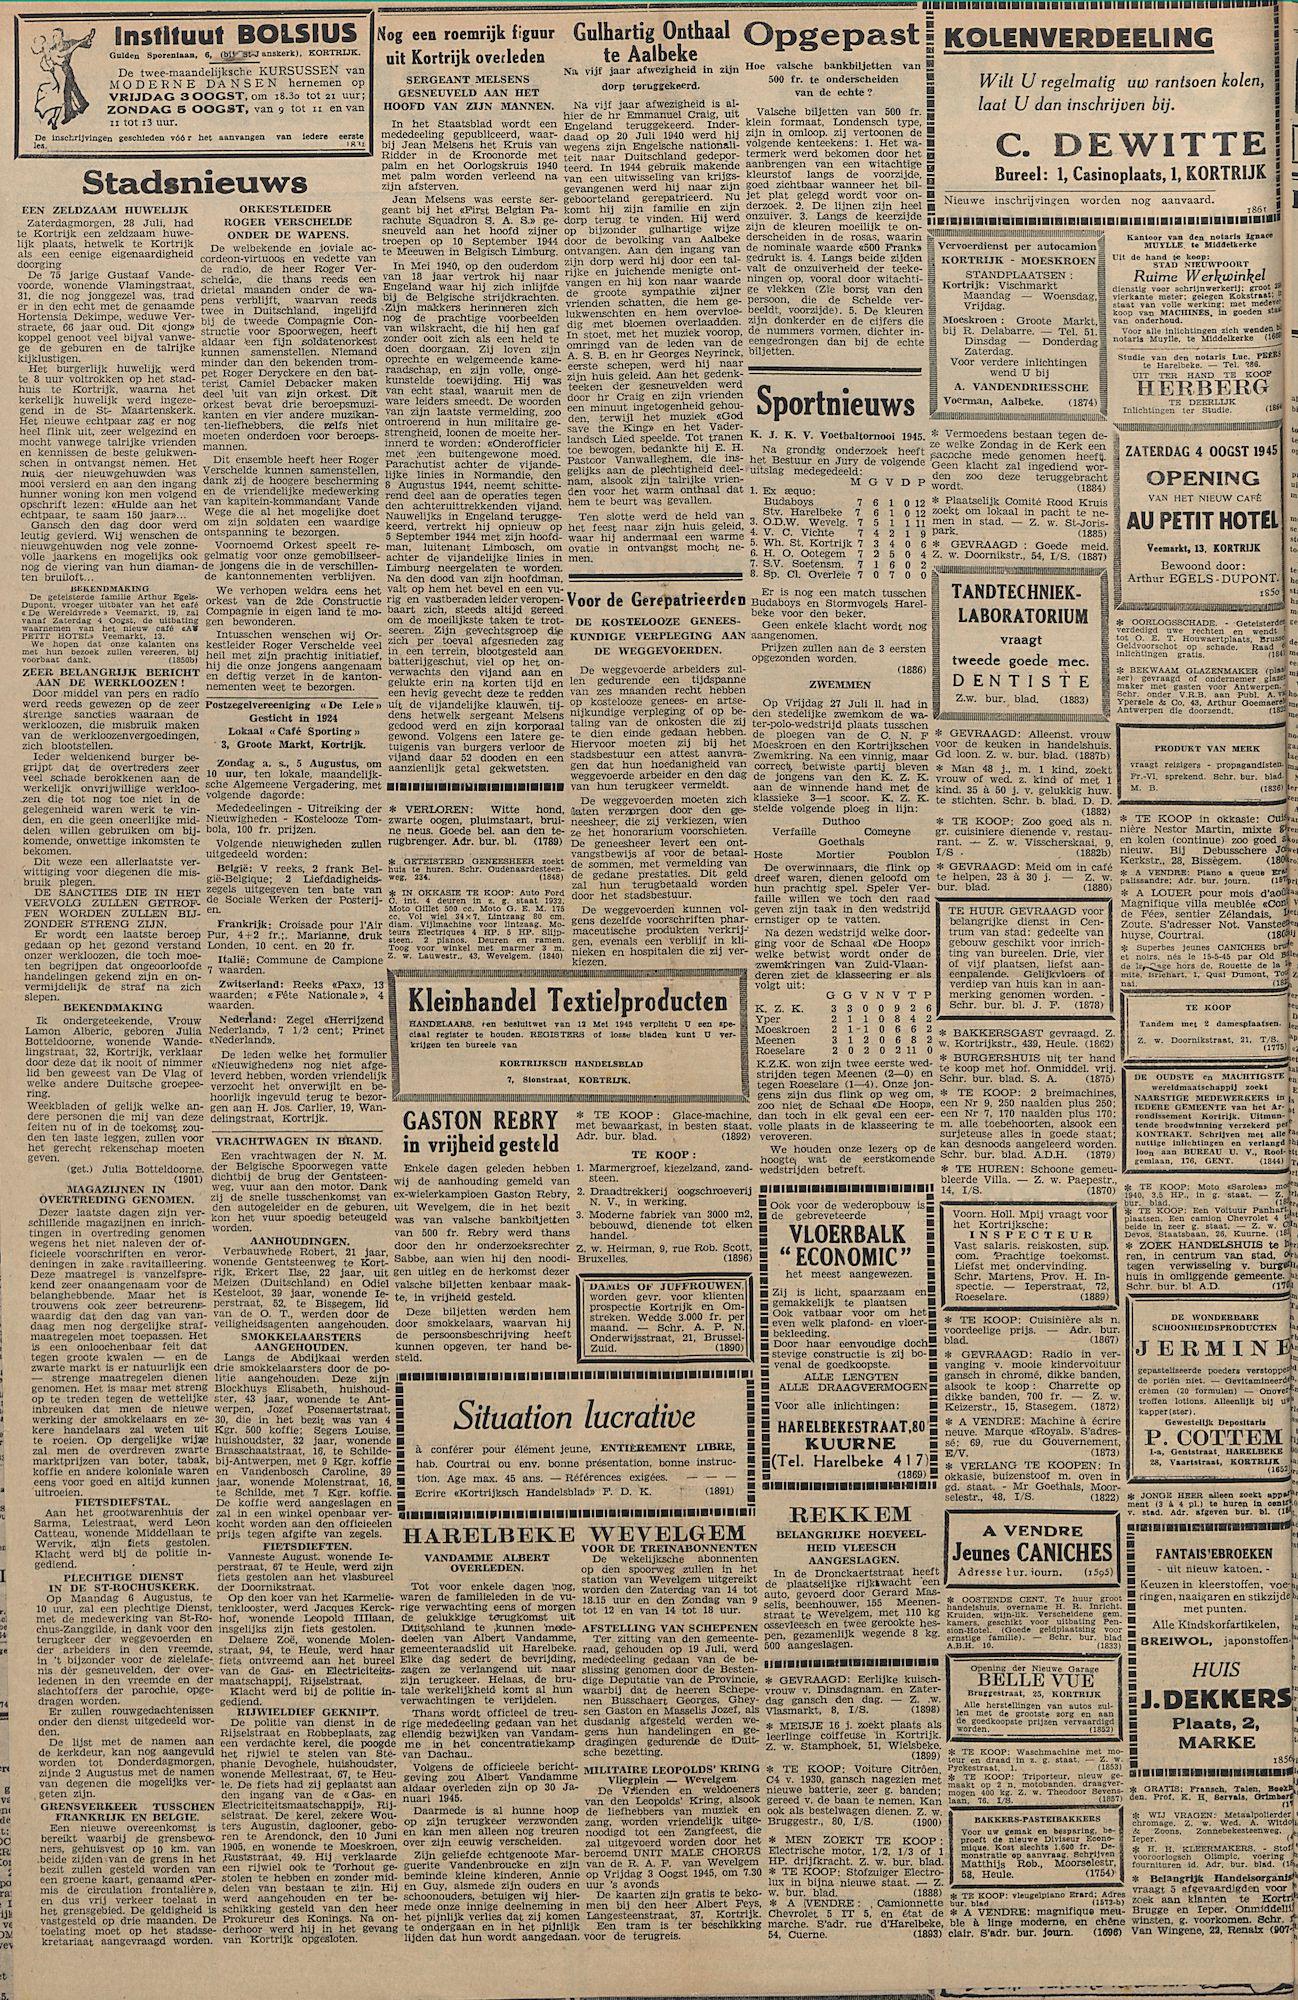 Kortrijksch Handelsblad 1 augustus 1945 Nr61 p2